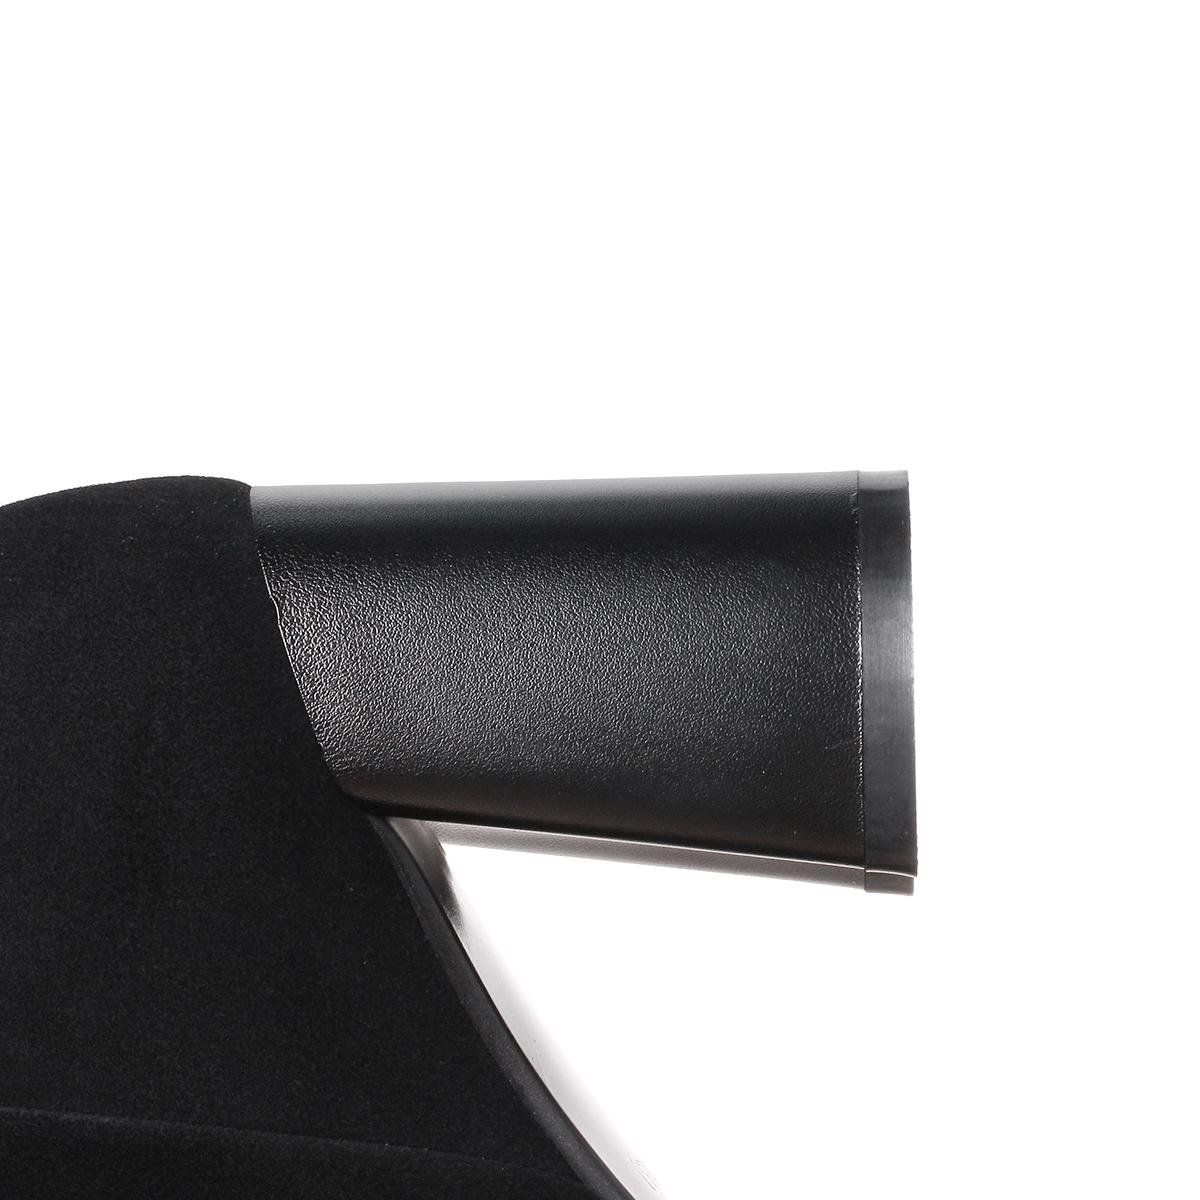 RBC Damen Kurze Stiefel Martin Chunky Chunky Martin High Heel Schuhe Runde Kopf Strappy Scrub Side Reißverschluss Freizeit Pumps Grün Schwarz Herbst Frühling Winter Party Karriere Prom, EUR 39  UK 5 5da2b8